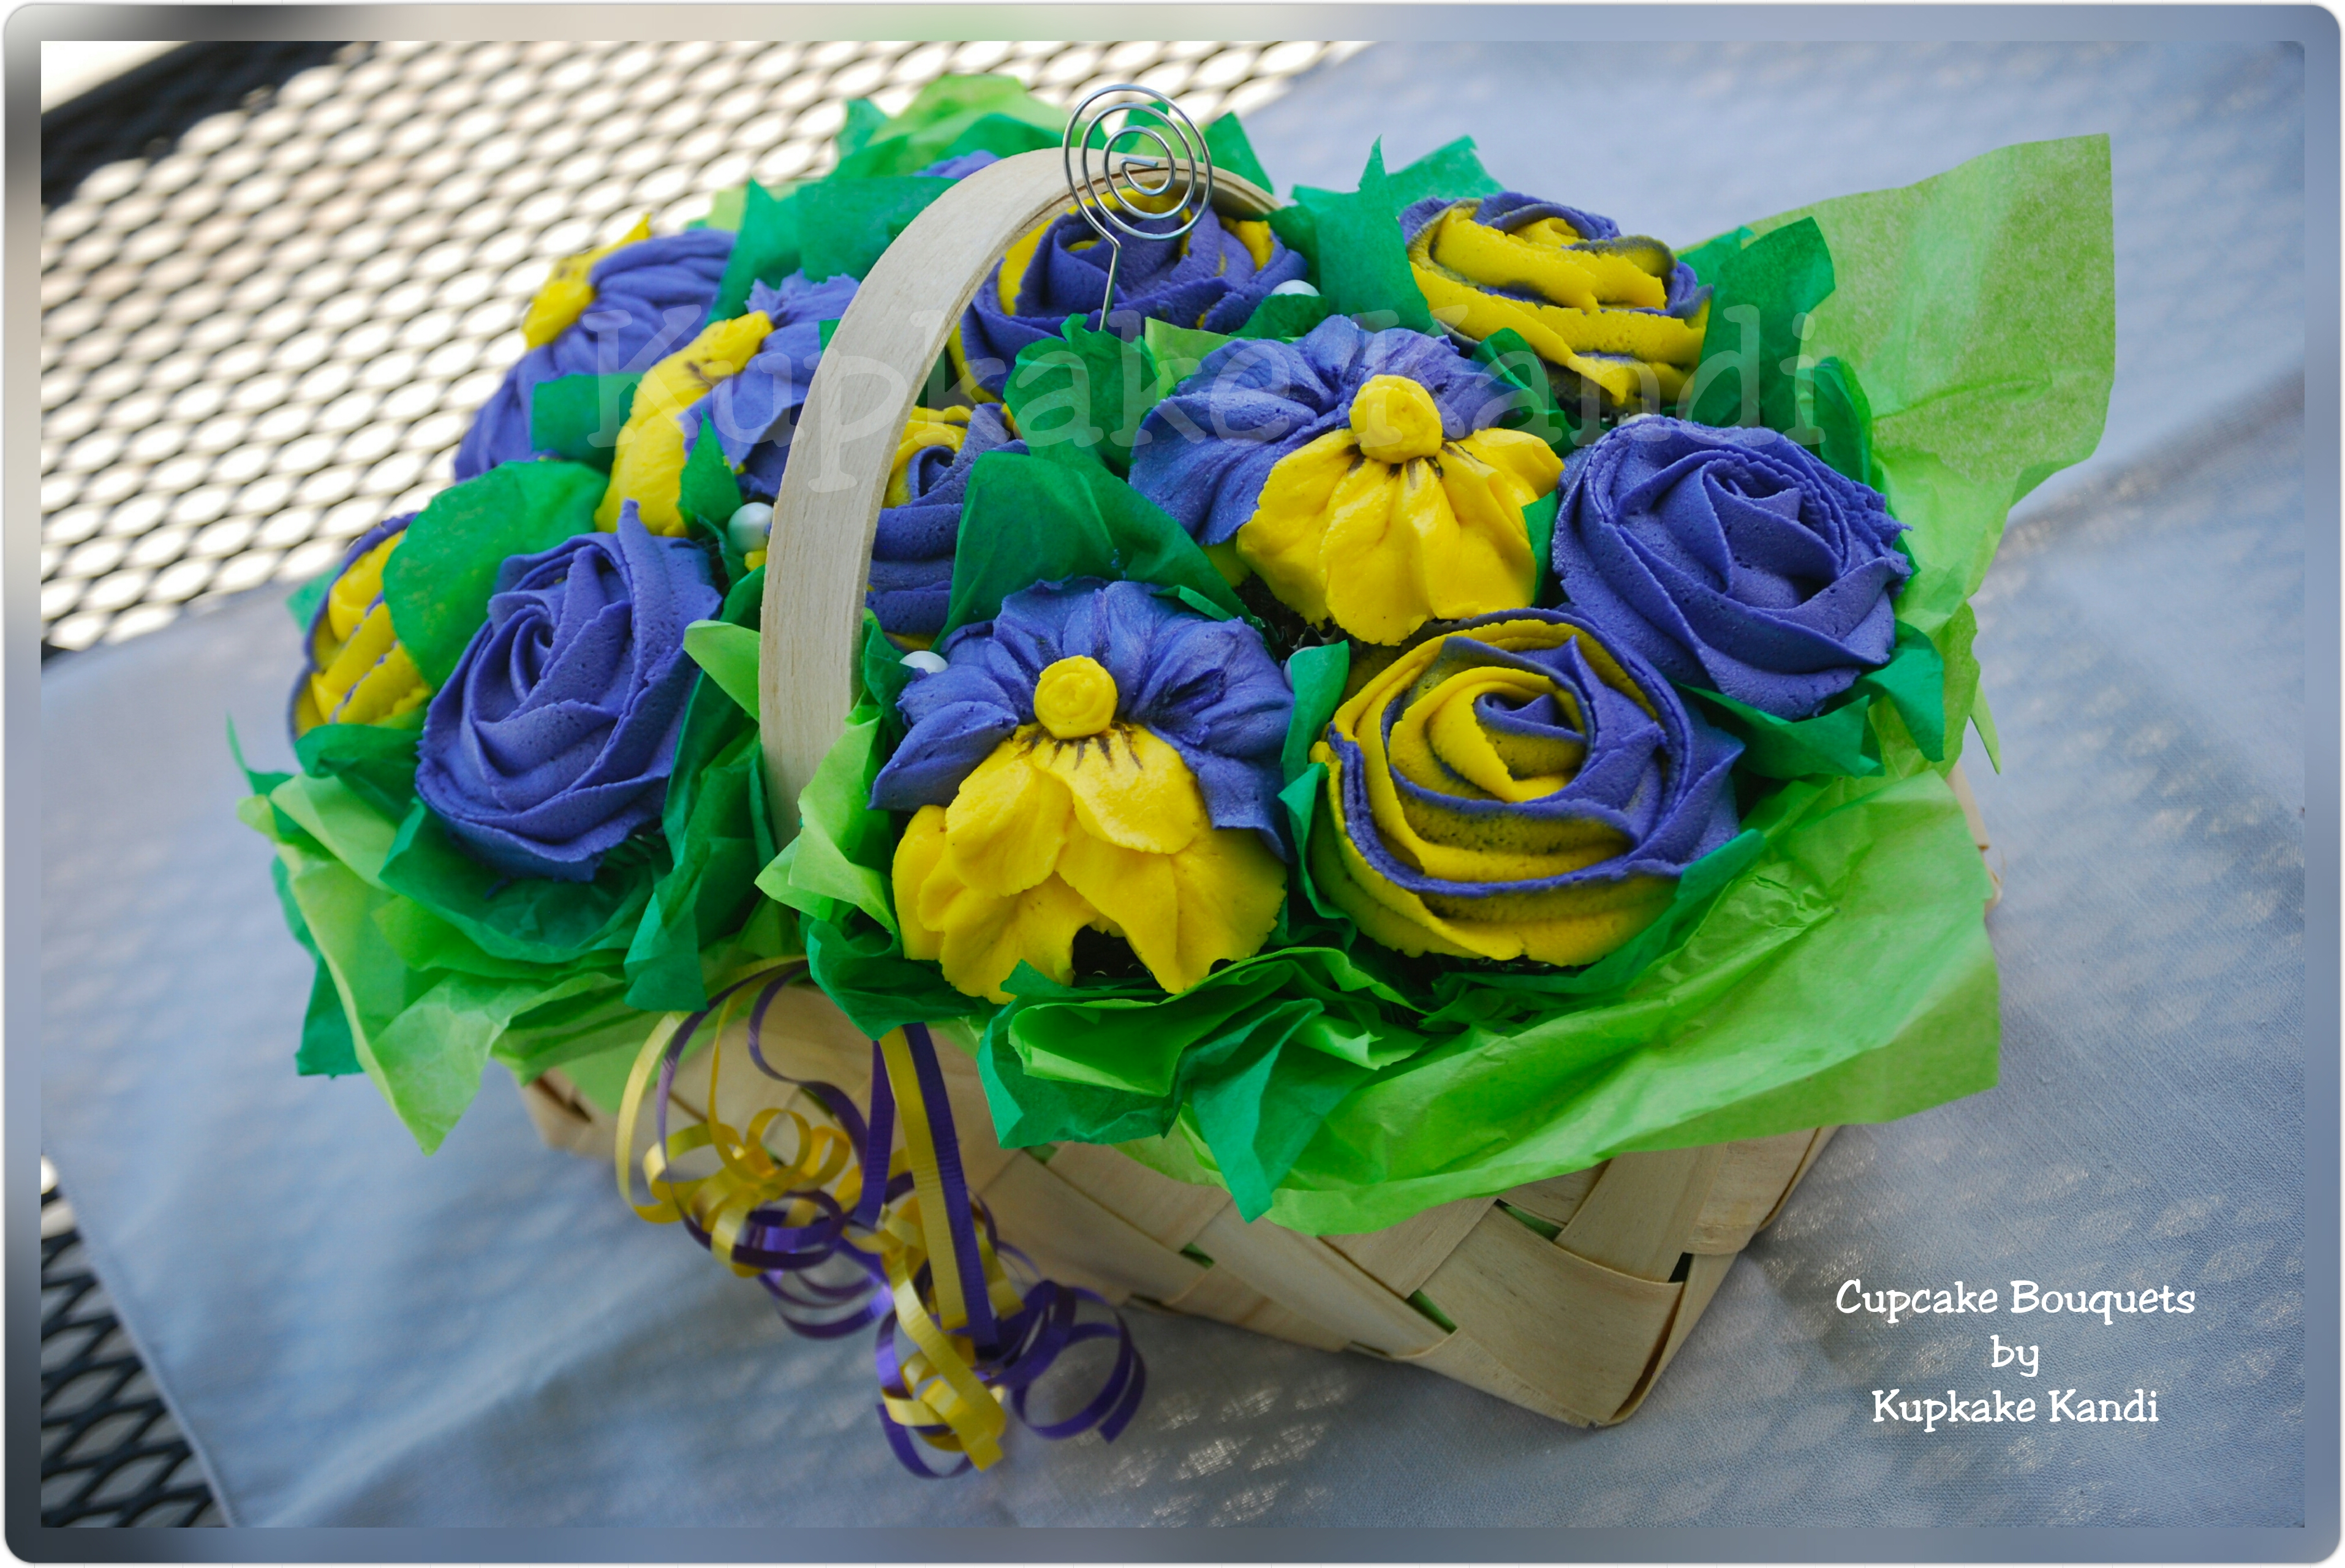 Cupcake bouquets kupkake kandi small garden basket with roses and pansies izmirmasajfo